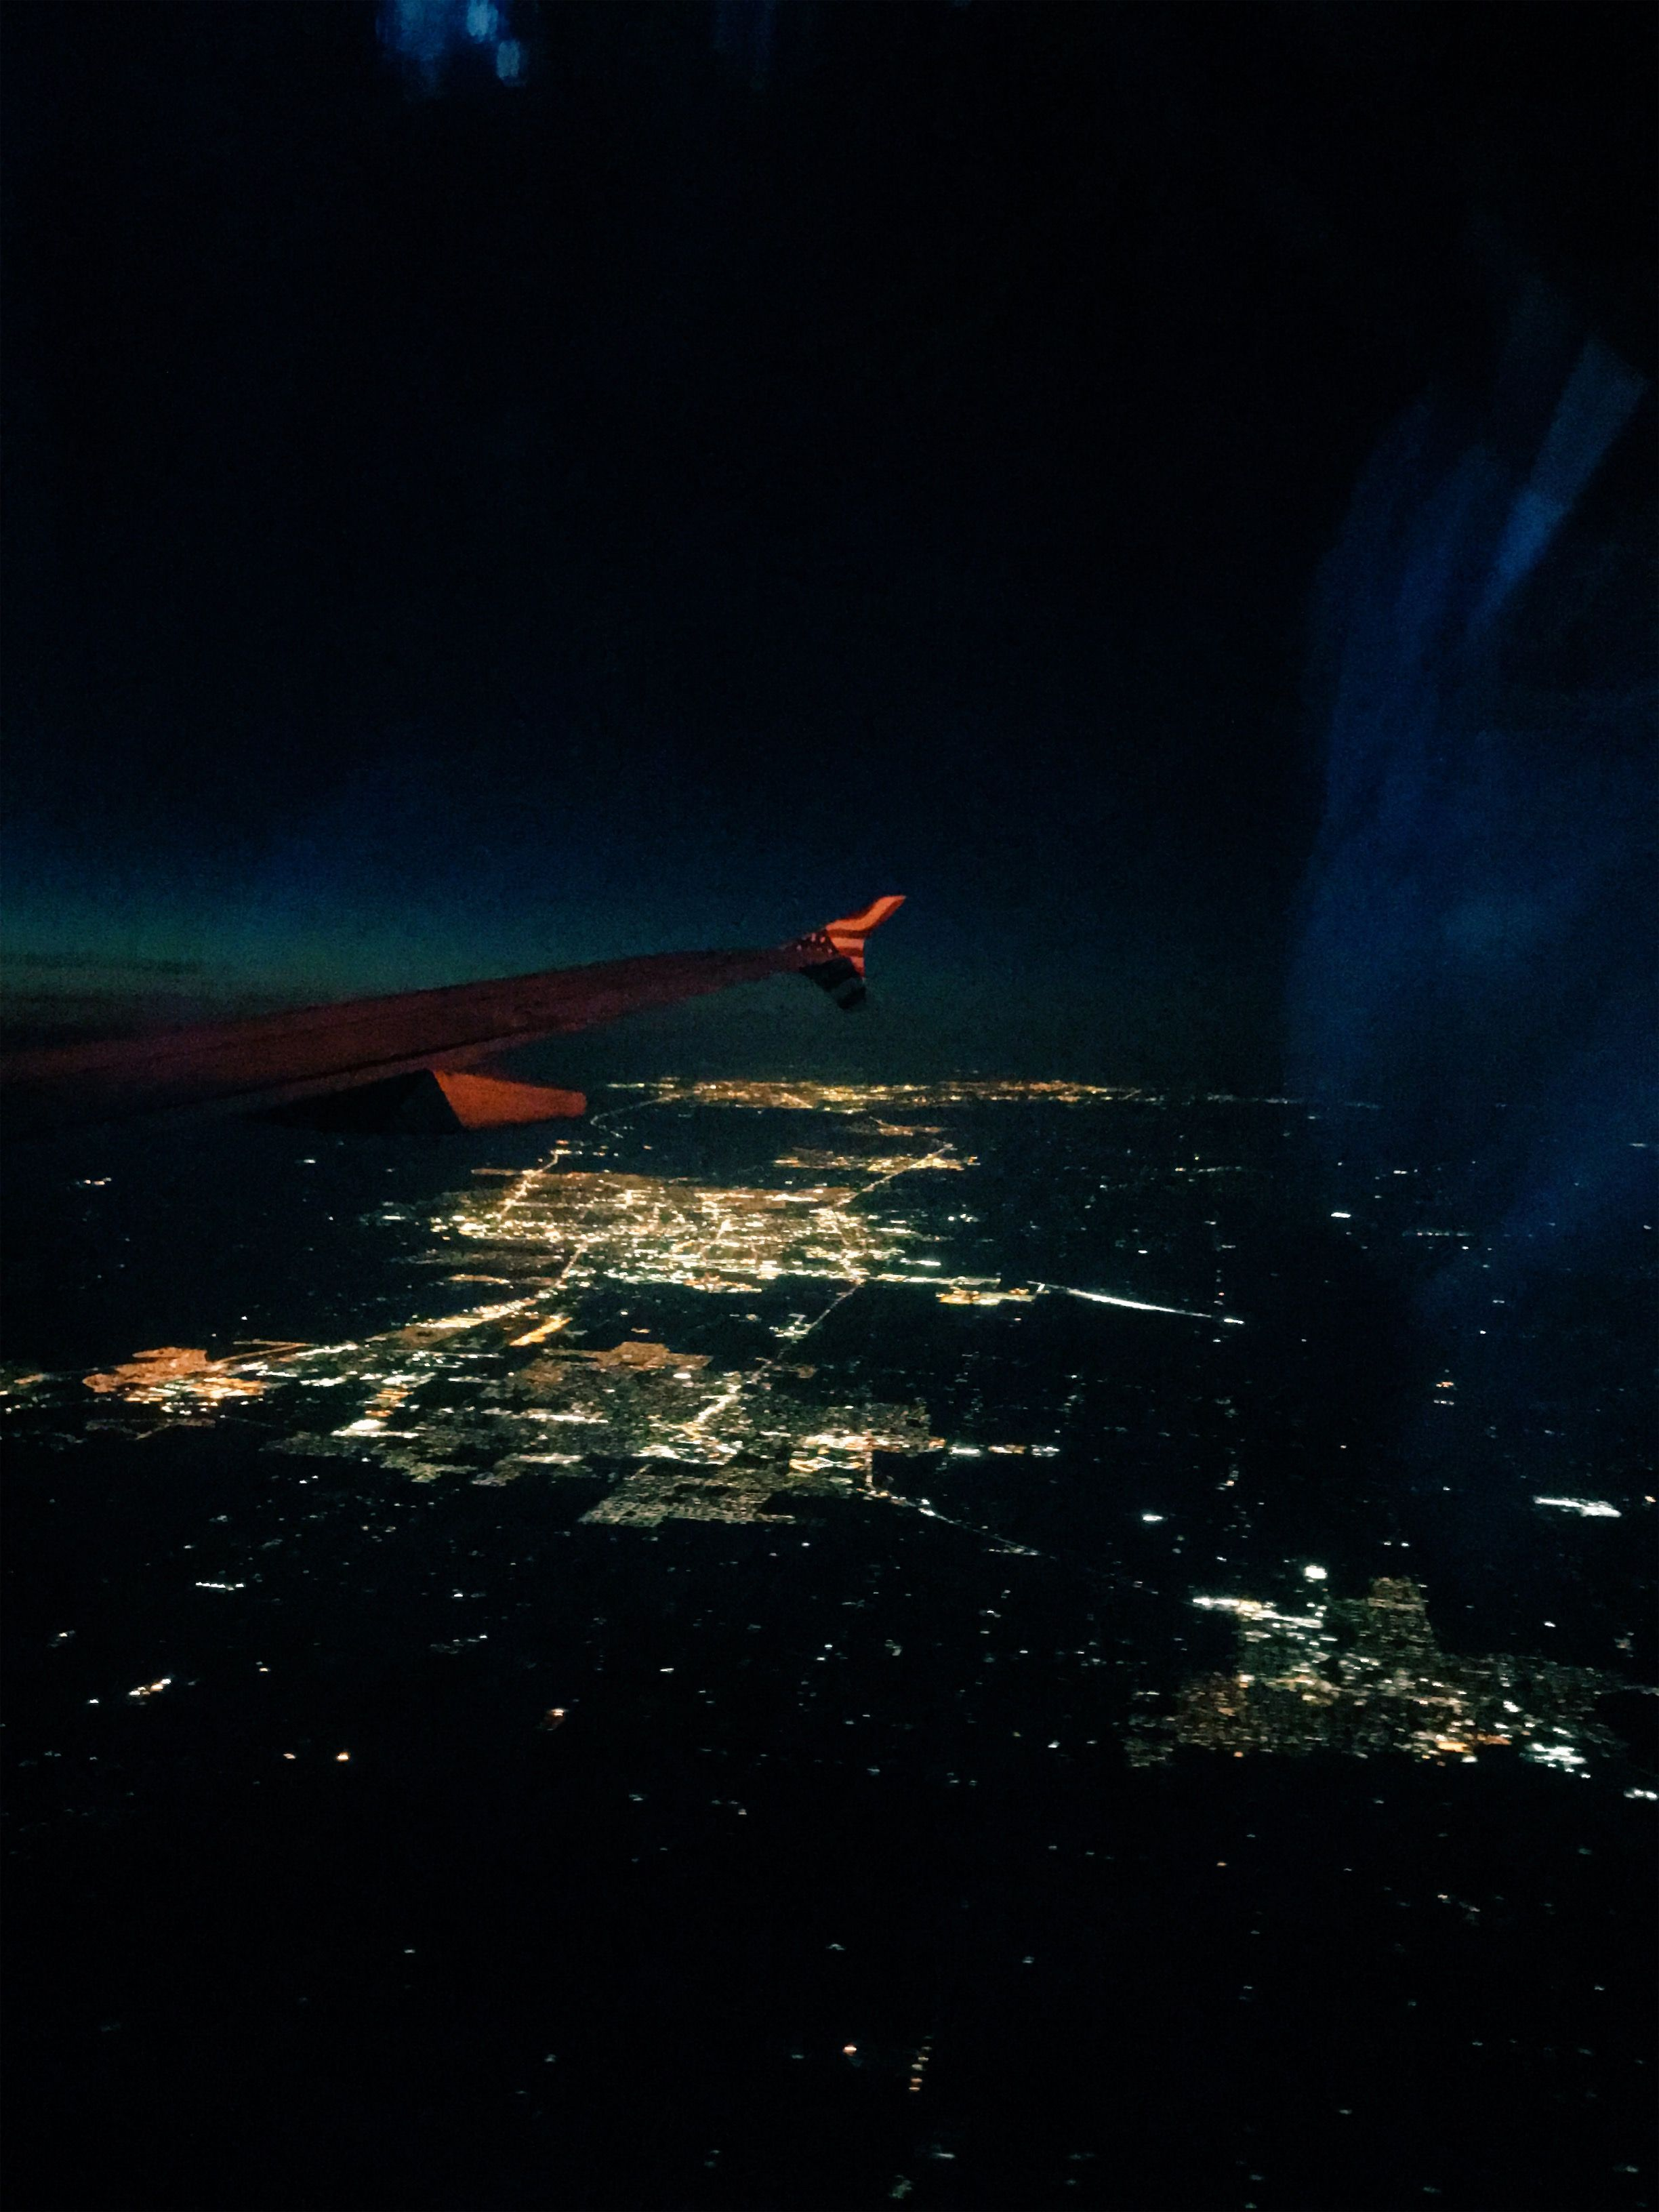 Airplane Plane Window Seat Views Sky Wing Flight Flights Travel